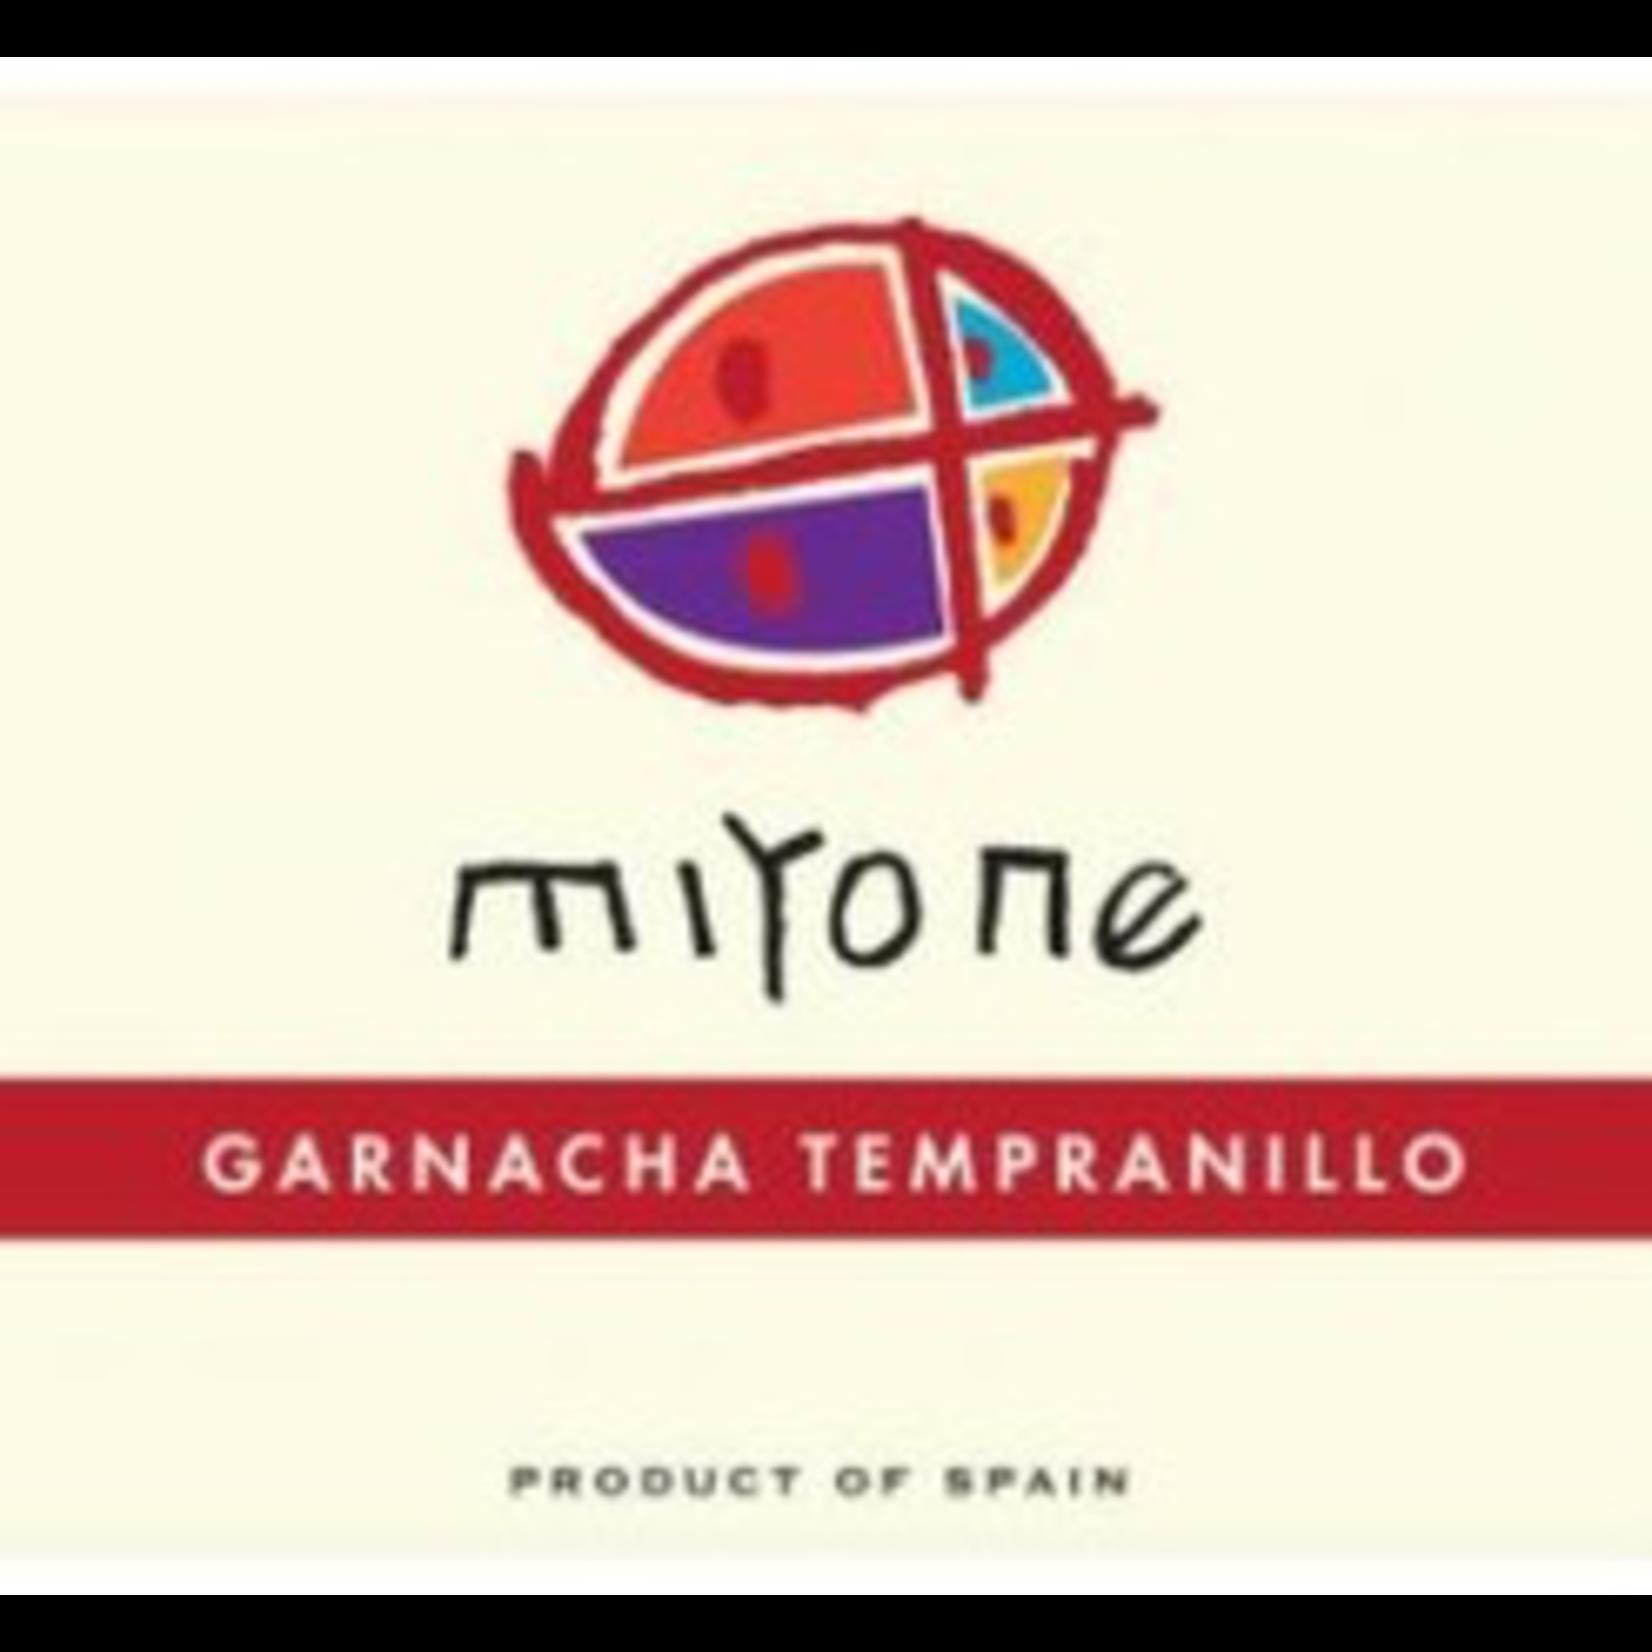 Mirone Family Garnacha Tempranillo 2018